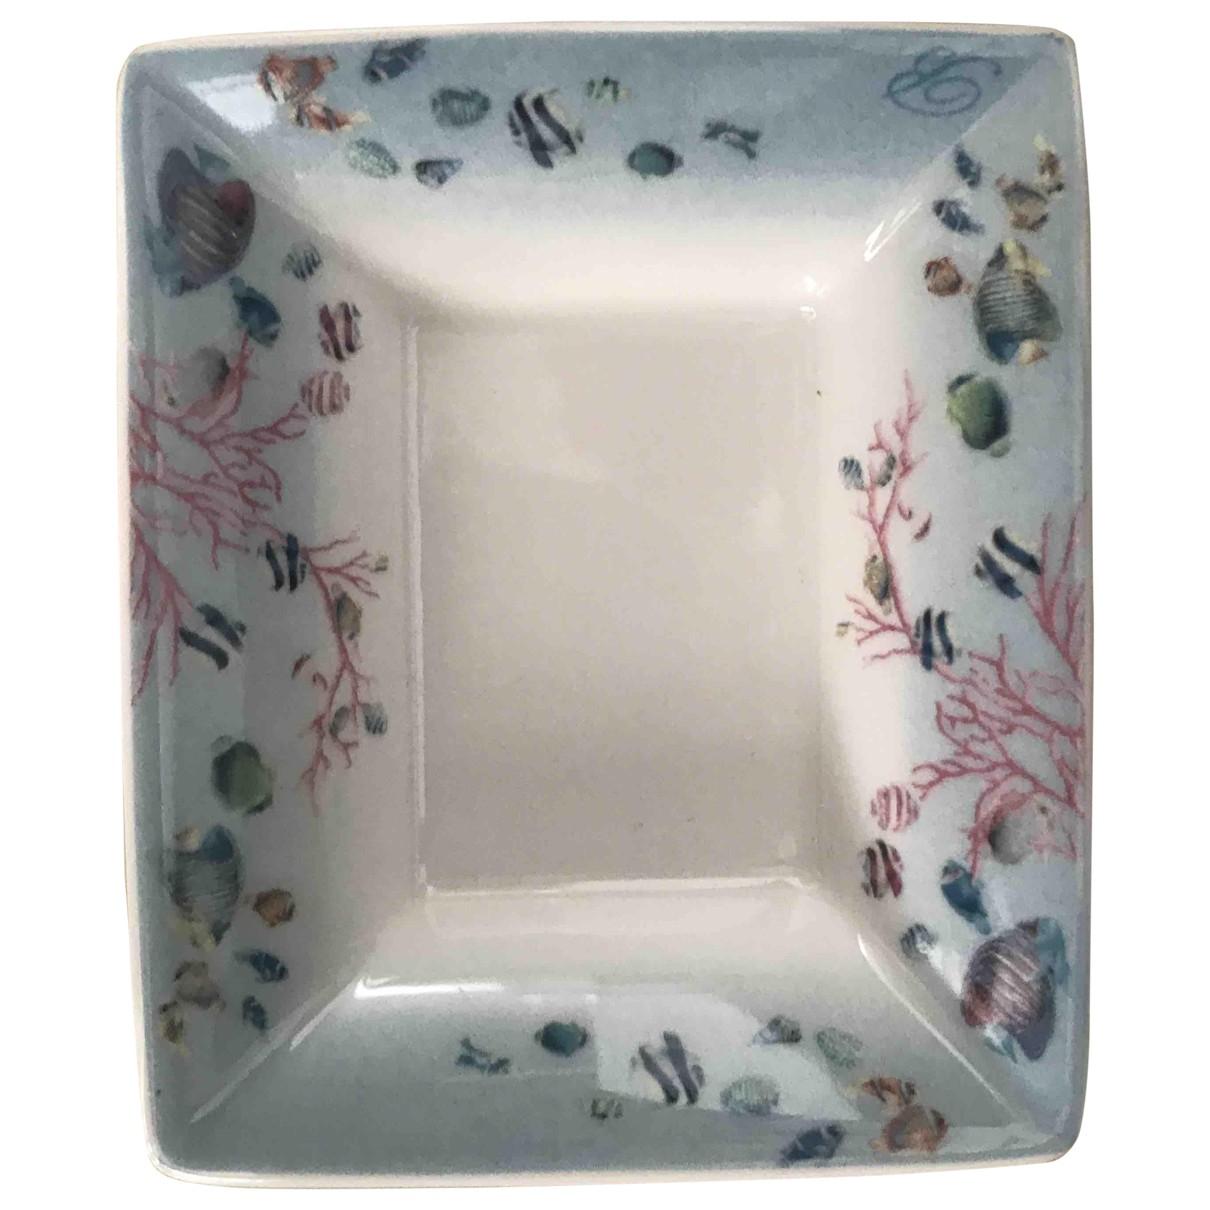 Cenicero de Ceramica Blumarine